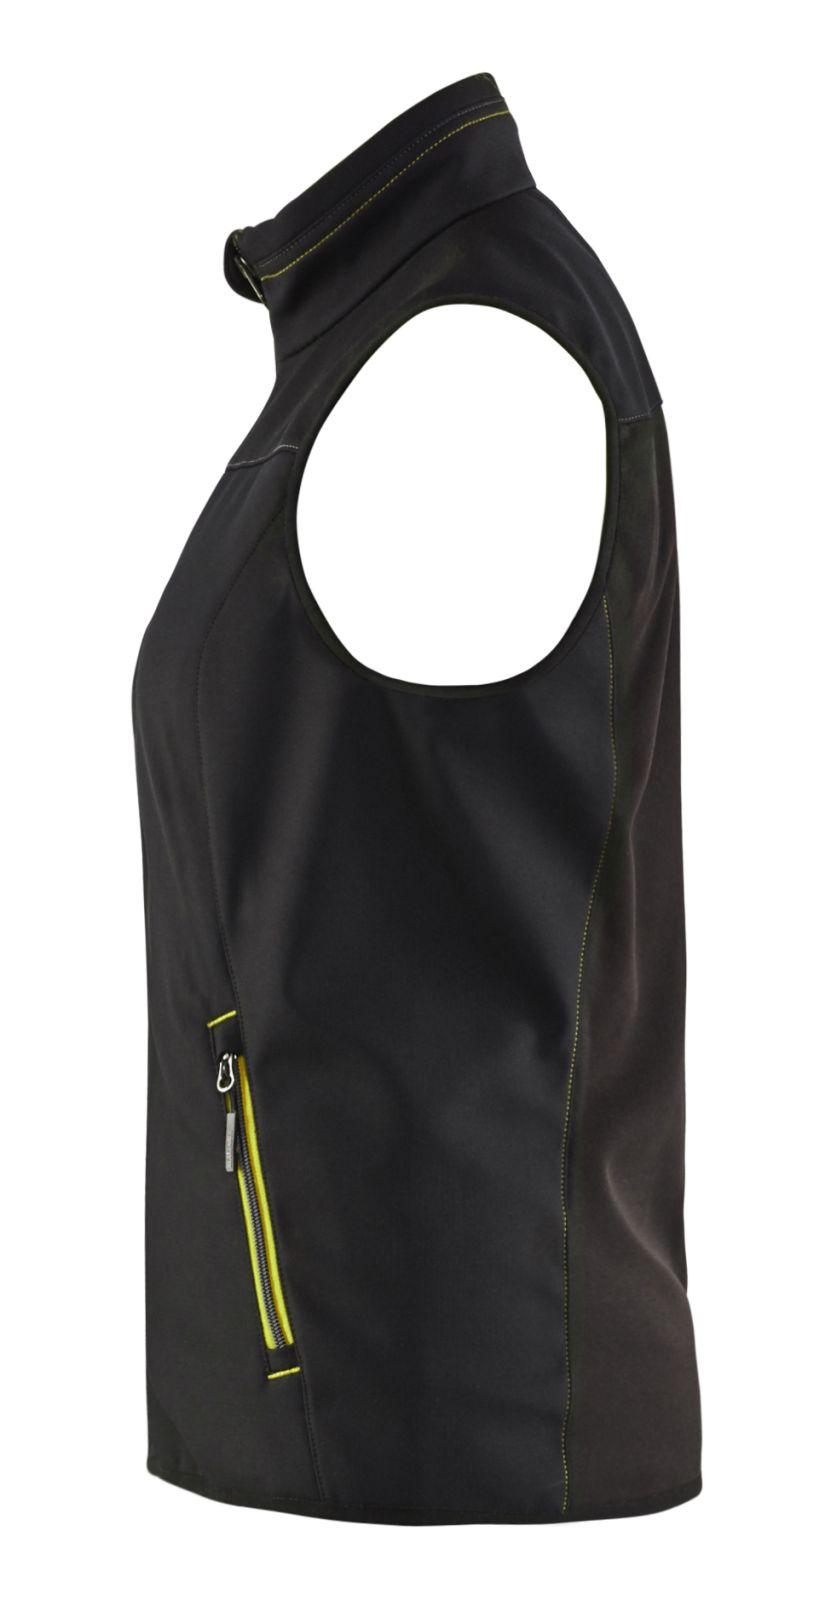 Blaklader Bodywarmers 38512516 zwart-fluo geel(9933)